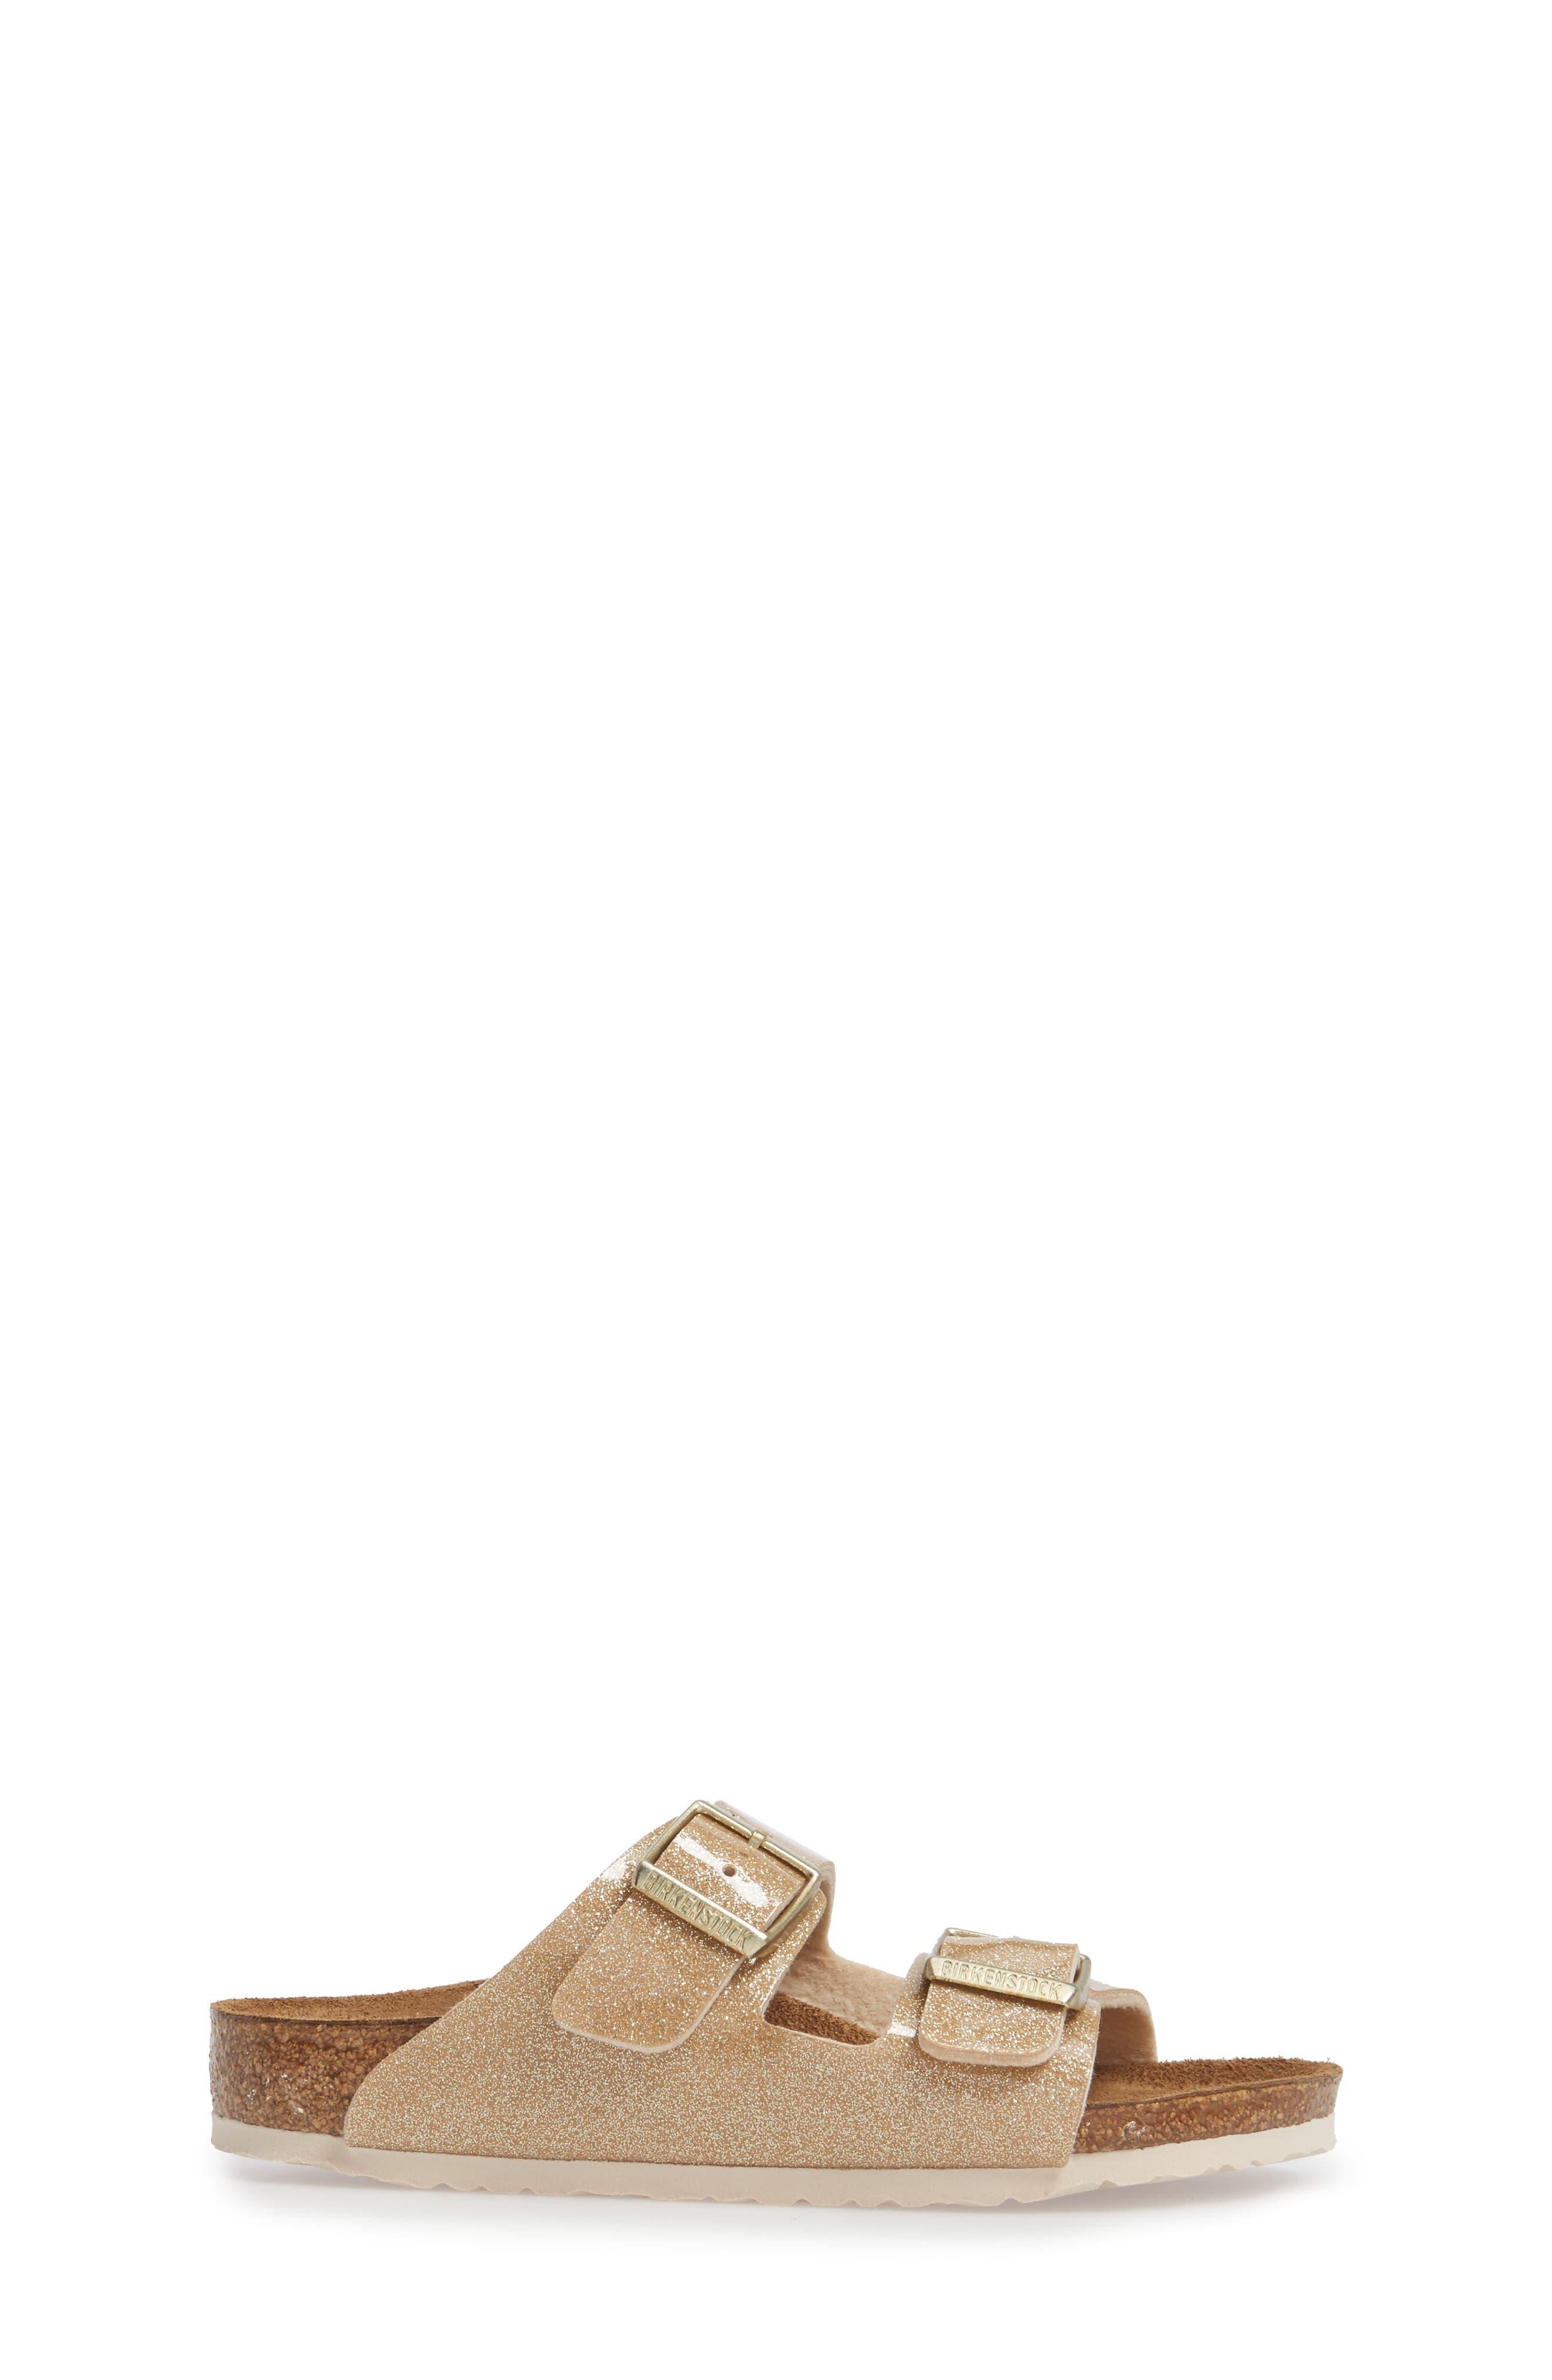 'Arizona Galaxy Birko-Flor' Slide Sandal,                             Alternate thumbnail 3, color,                             Galaxy Gold